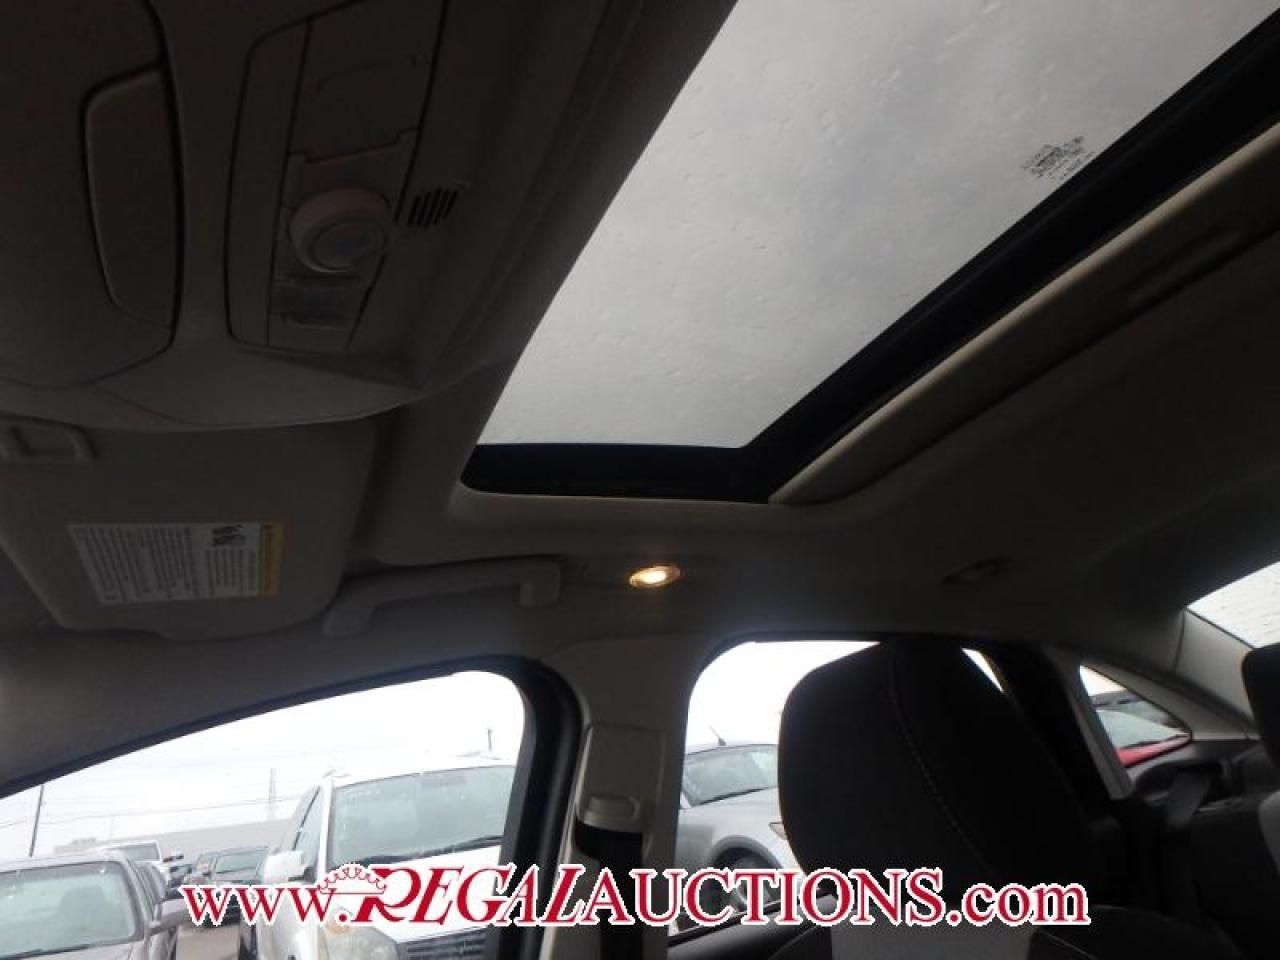 2014 Ford Focus SE 4D Sedan 2.0L